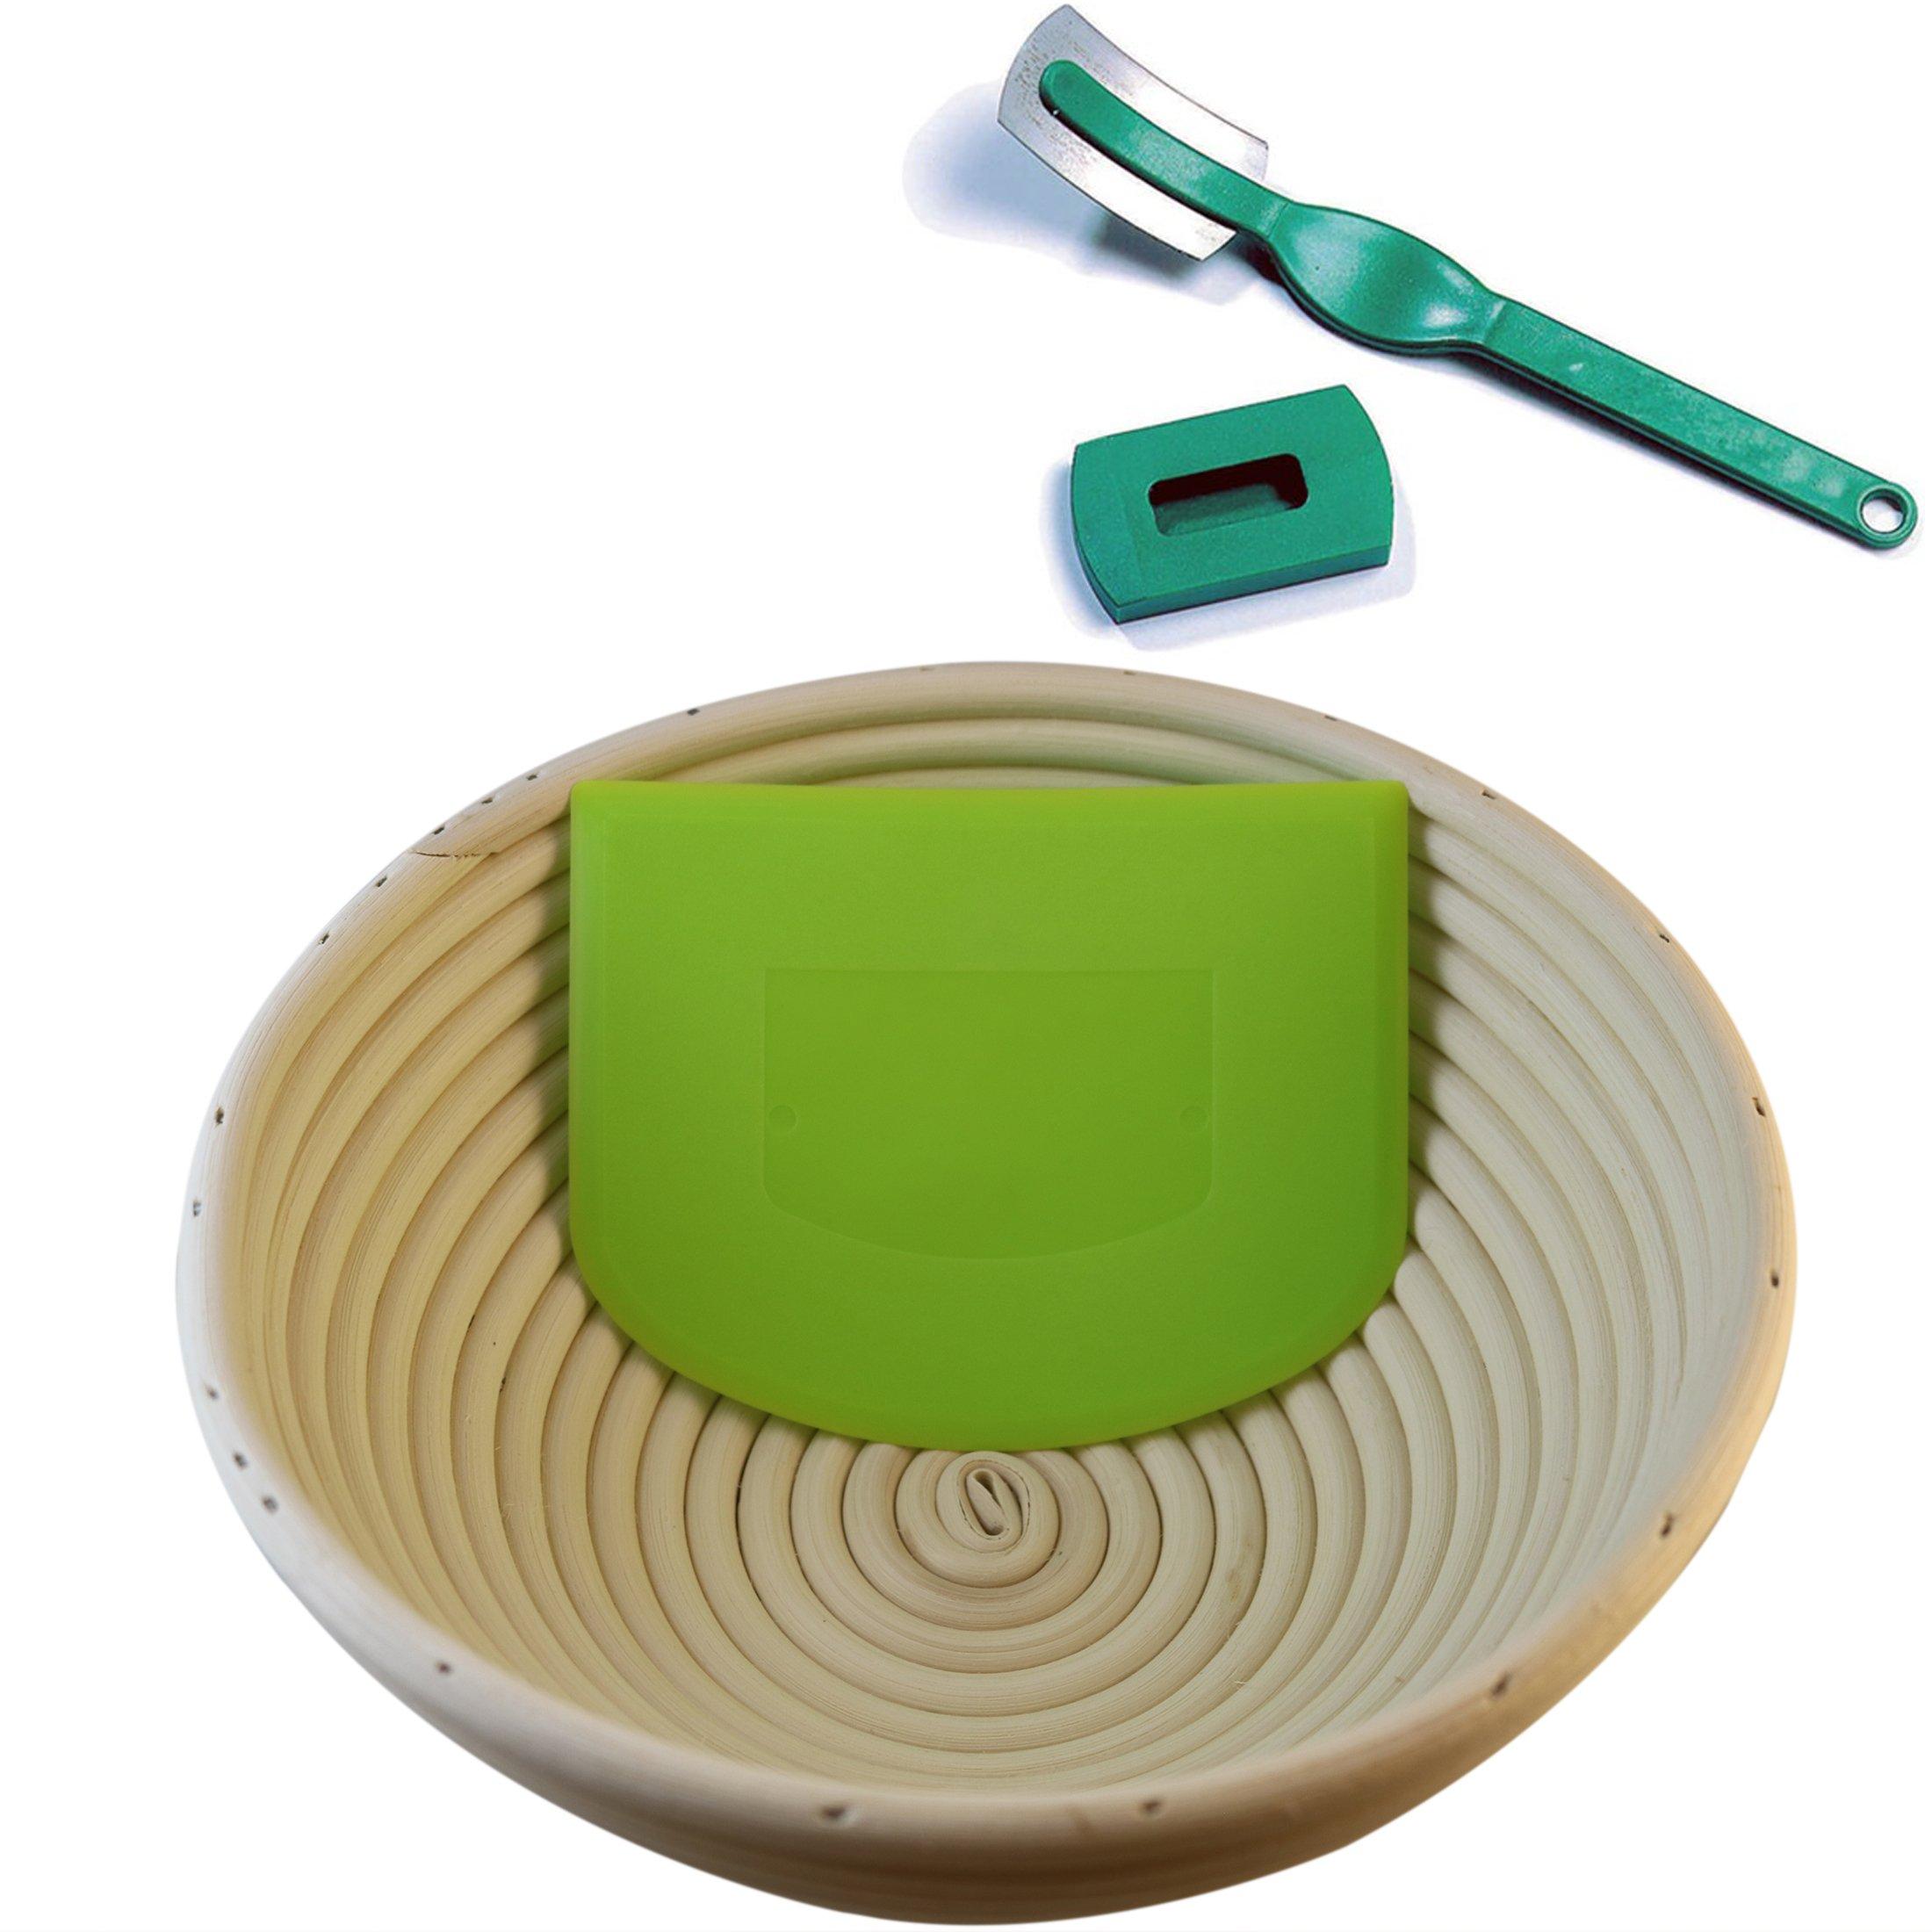 Banneton Proofing Basket 8'' | Natural Elasticated Linen Banneton Liner | Ergonomical Designed Dough Scraper | Dough Scoring Lame | Charles Good Food by Charles Good Food